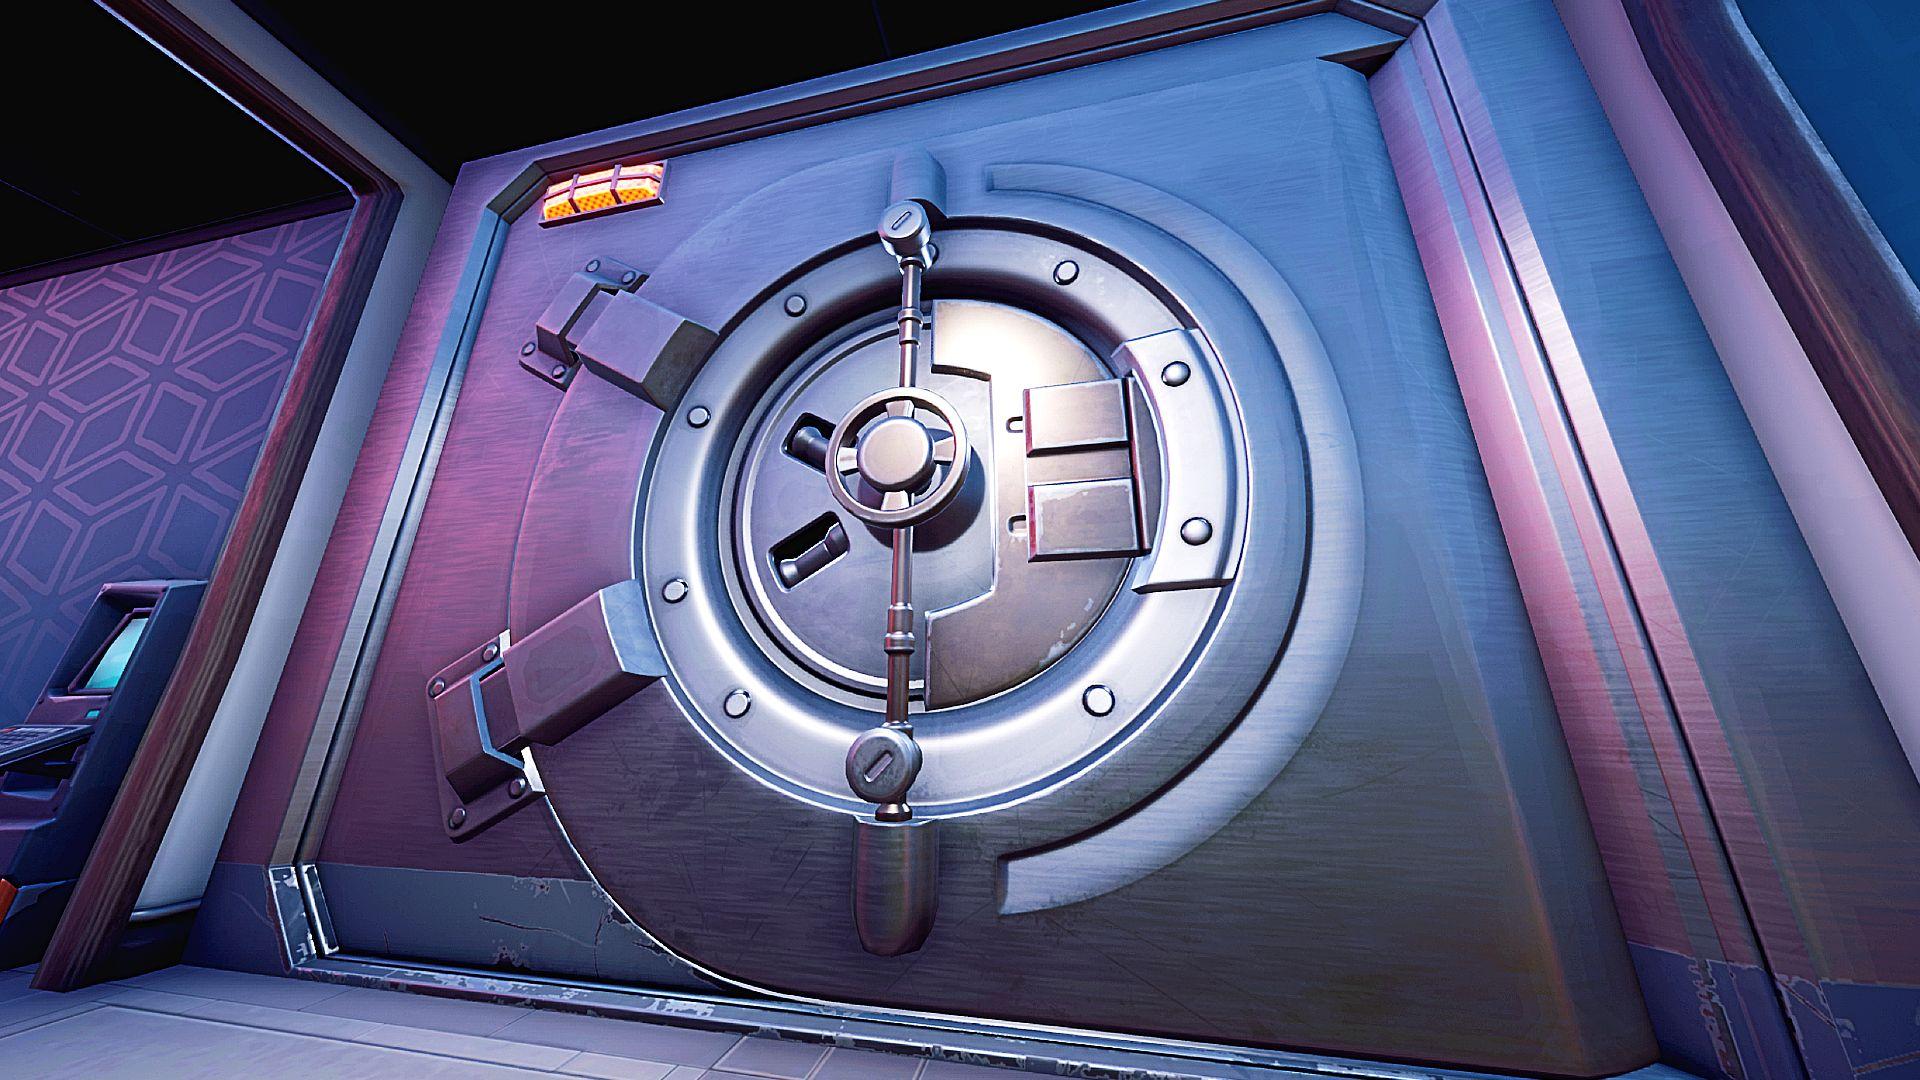 Fortnite Season 2 Chapter 2 Secret Vault Locations Guide - RespawnFirst